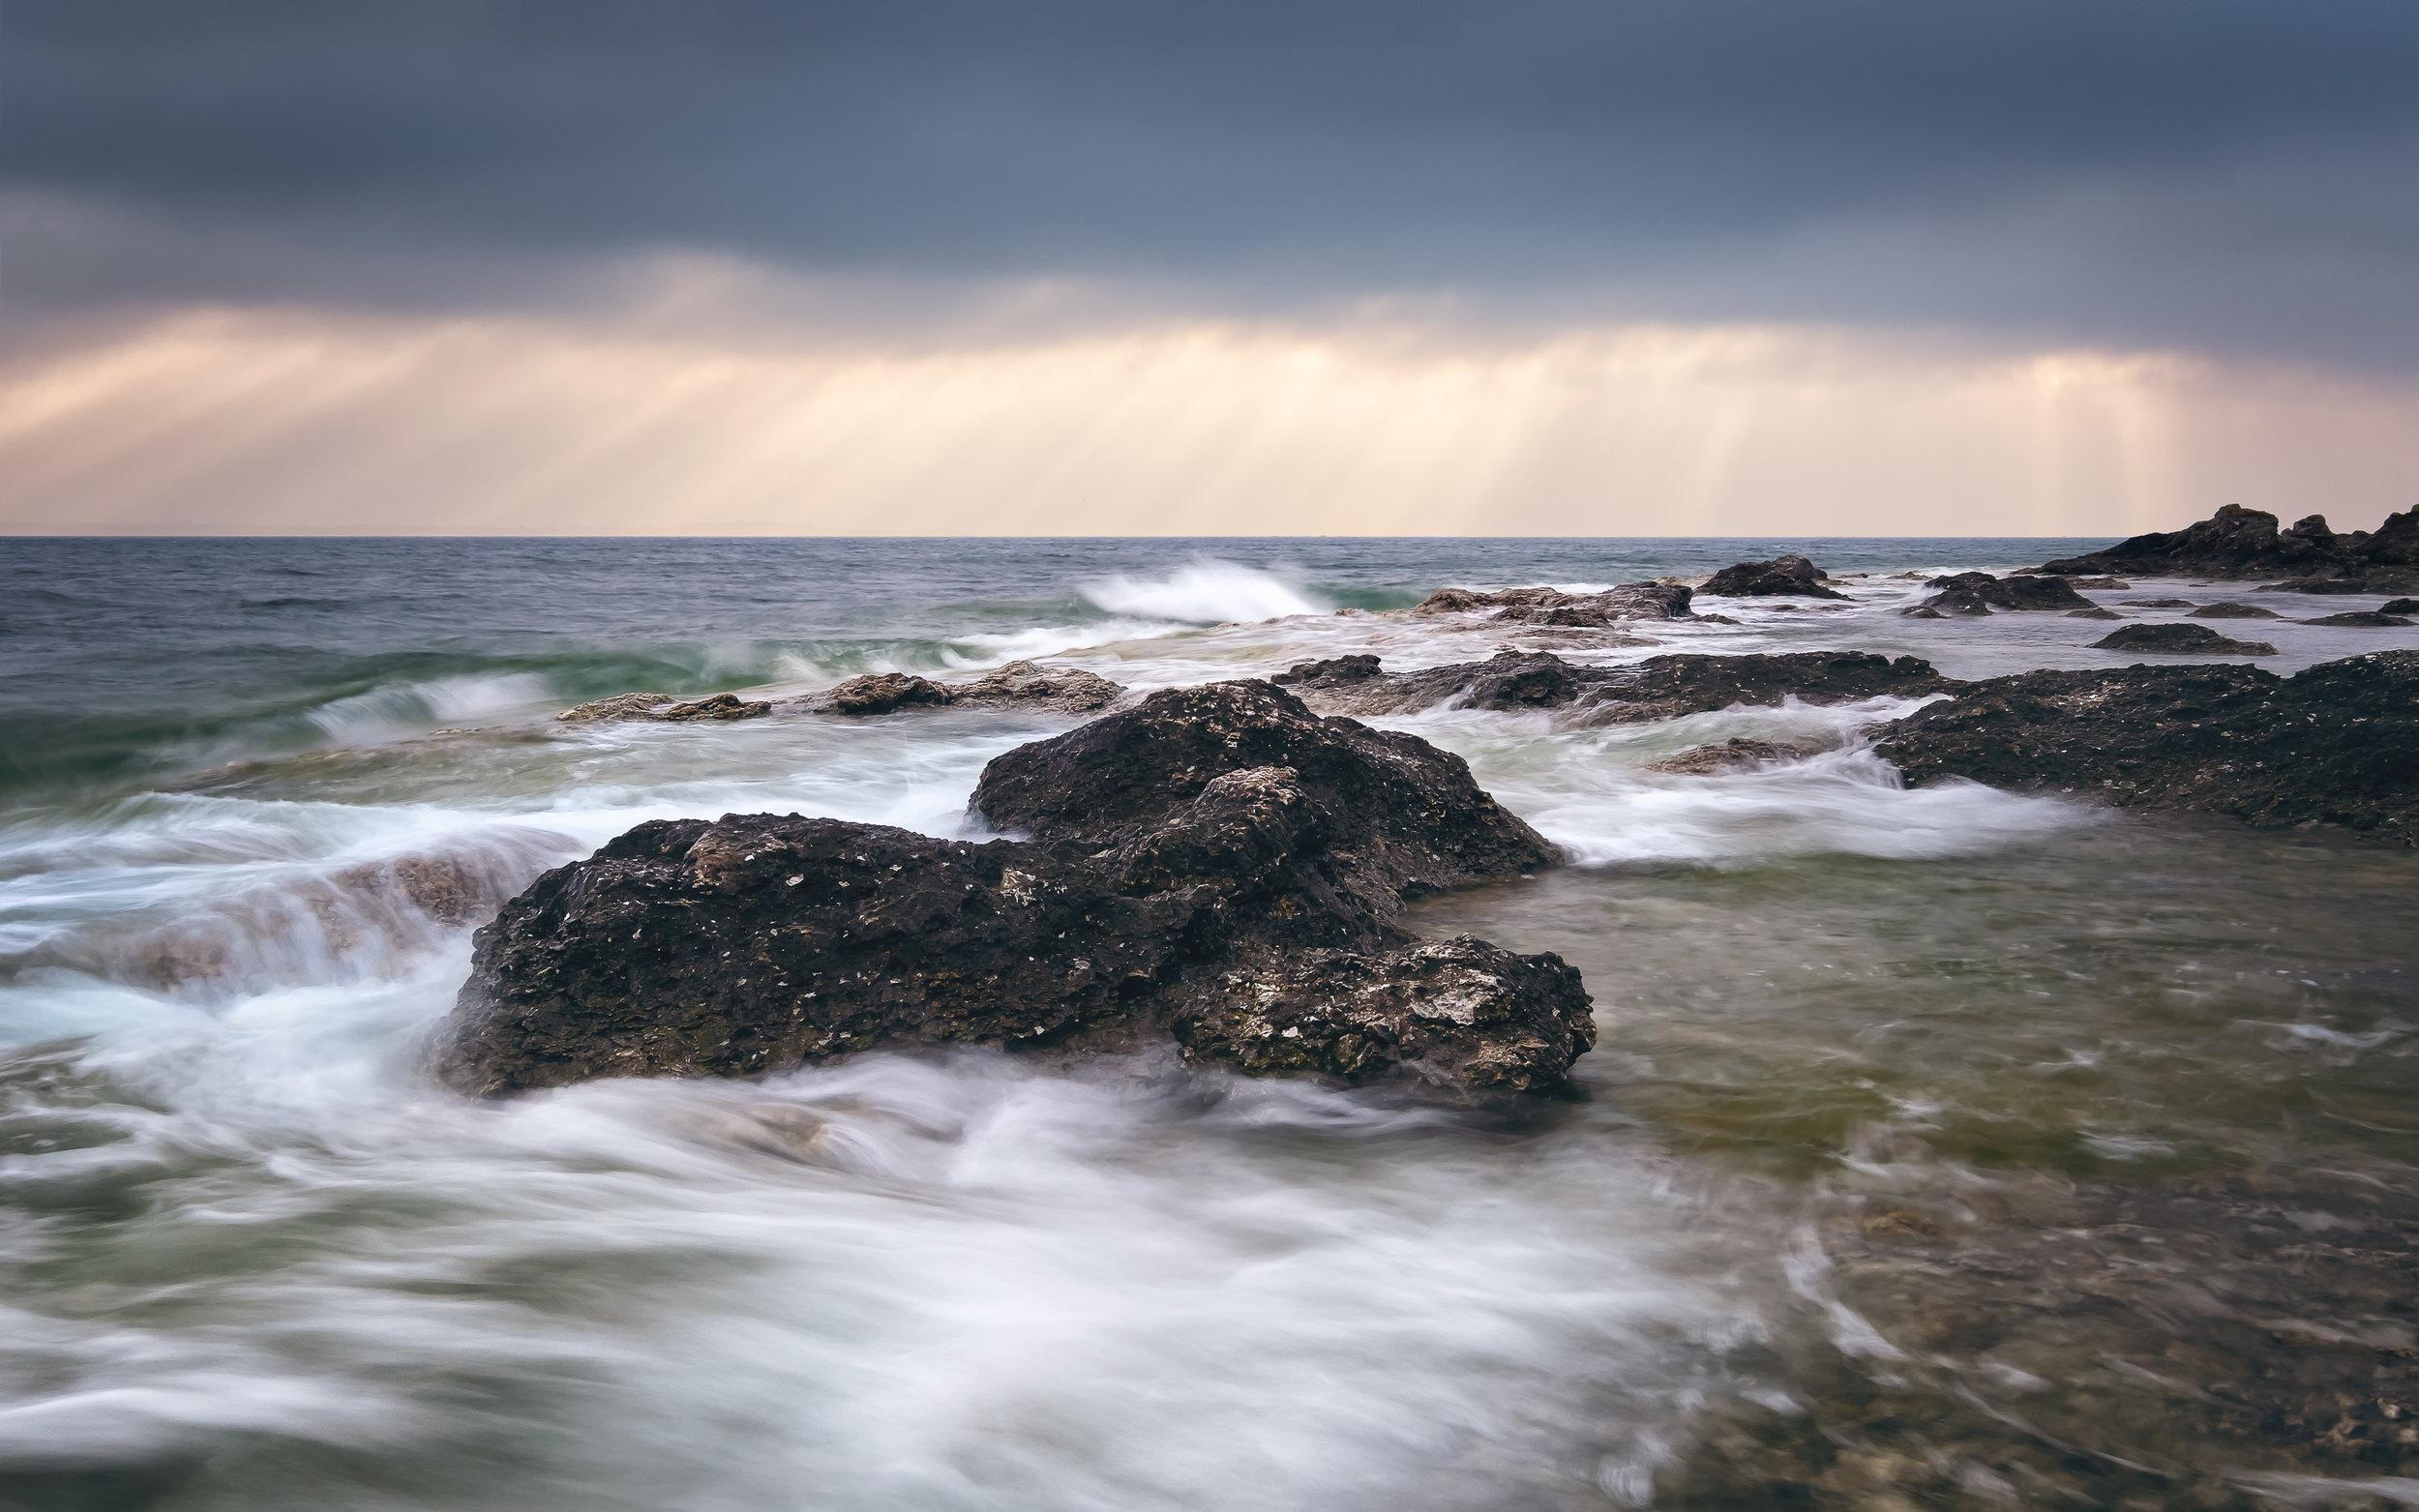 The mornig sea floats between the rocks